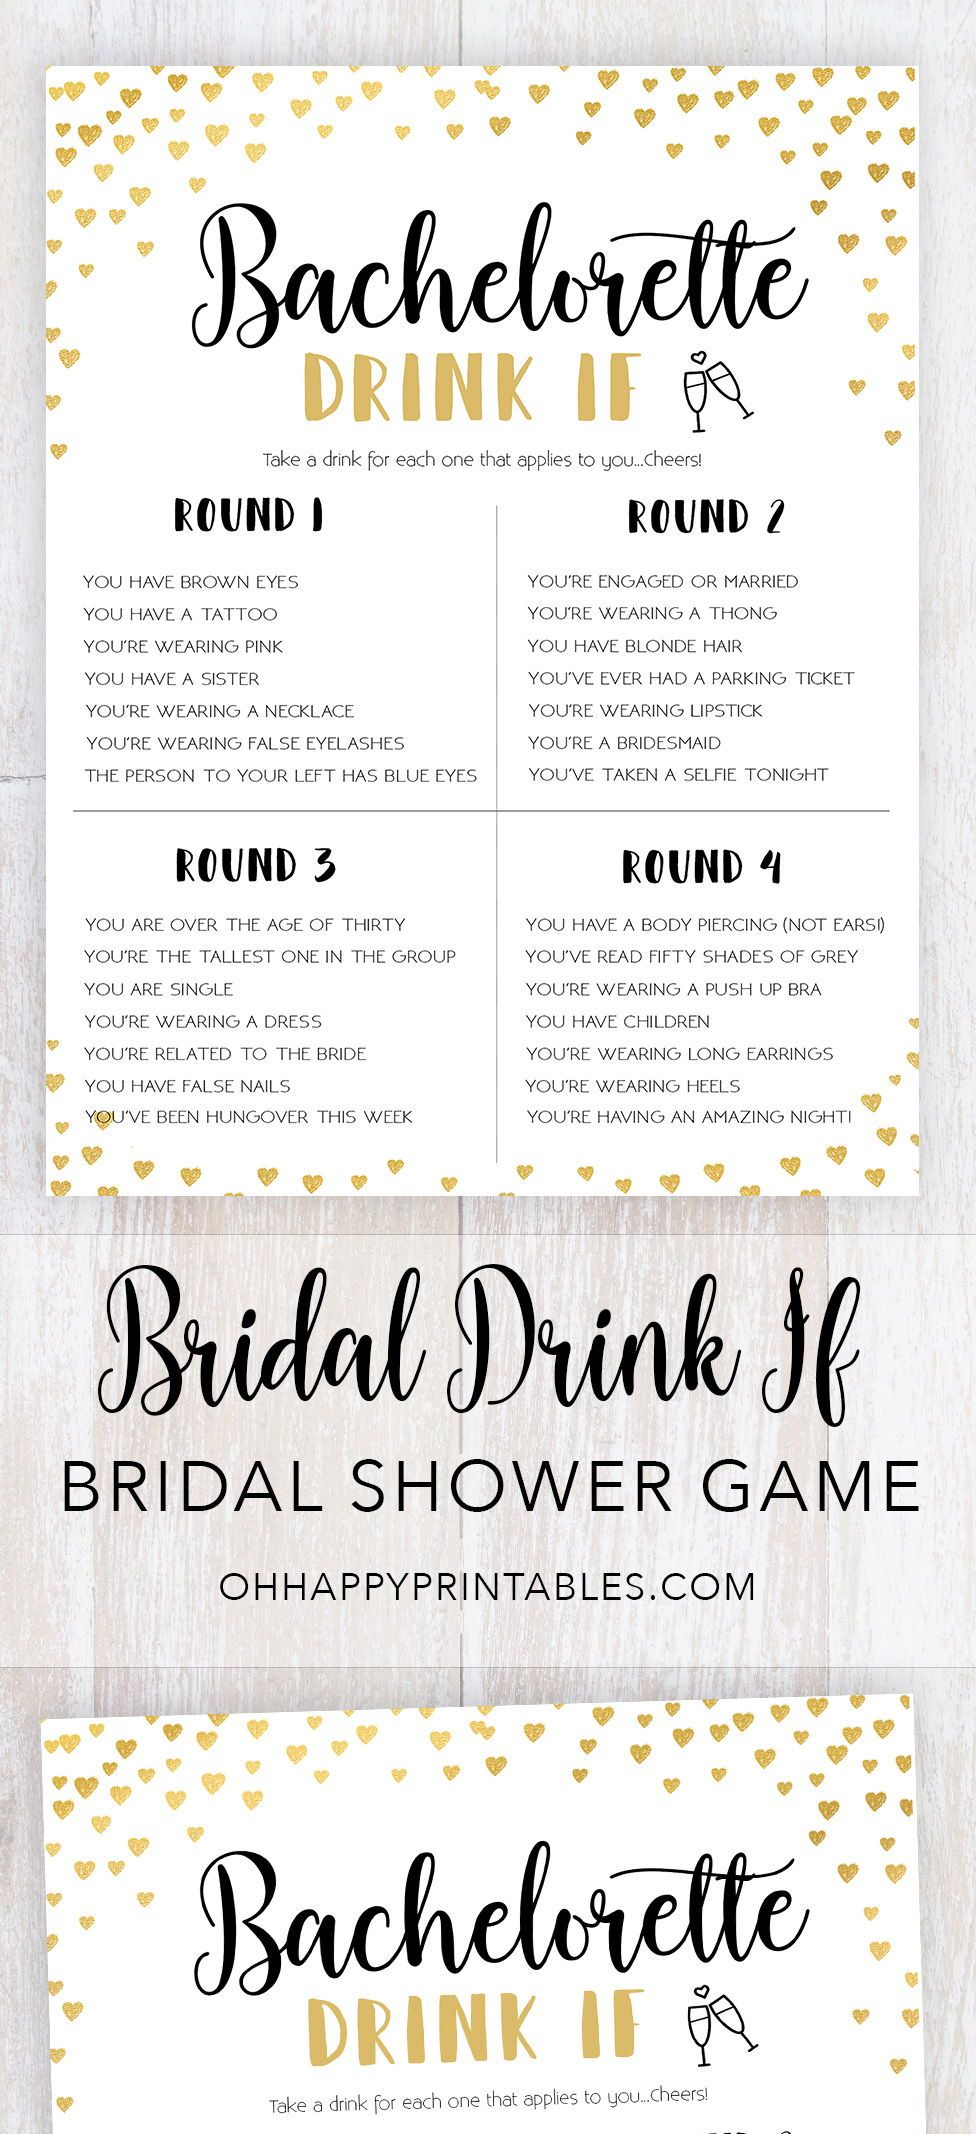 Bachelorette Drink If Bachelorette Party Games Bachelorette